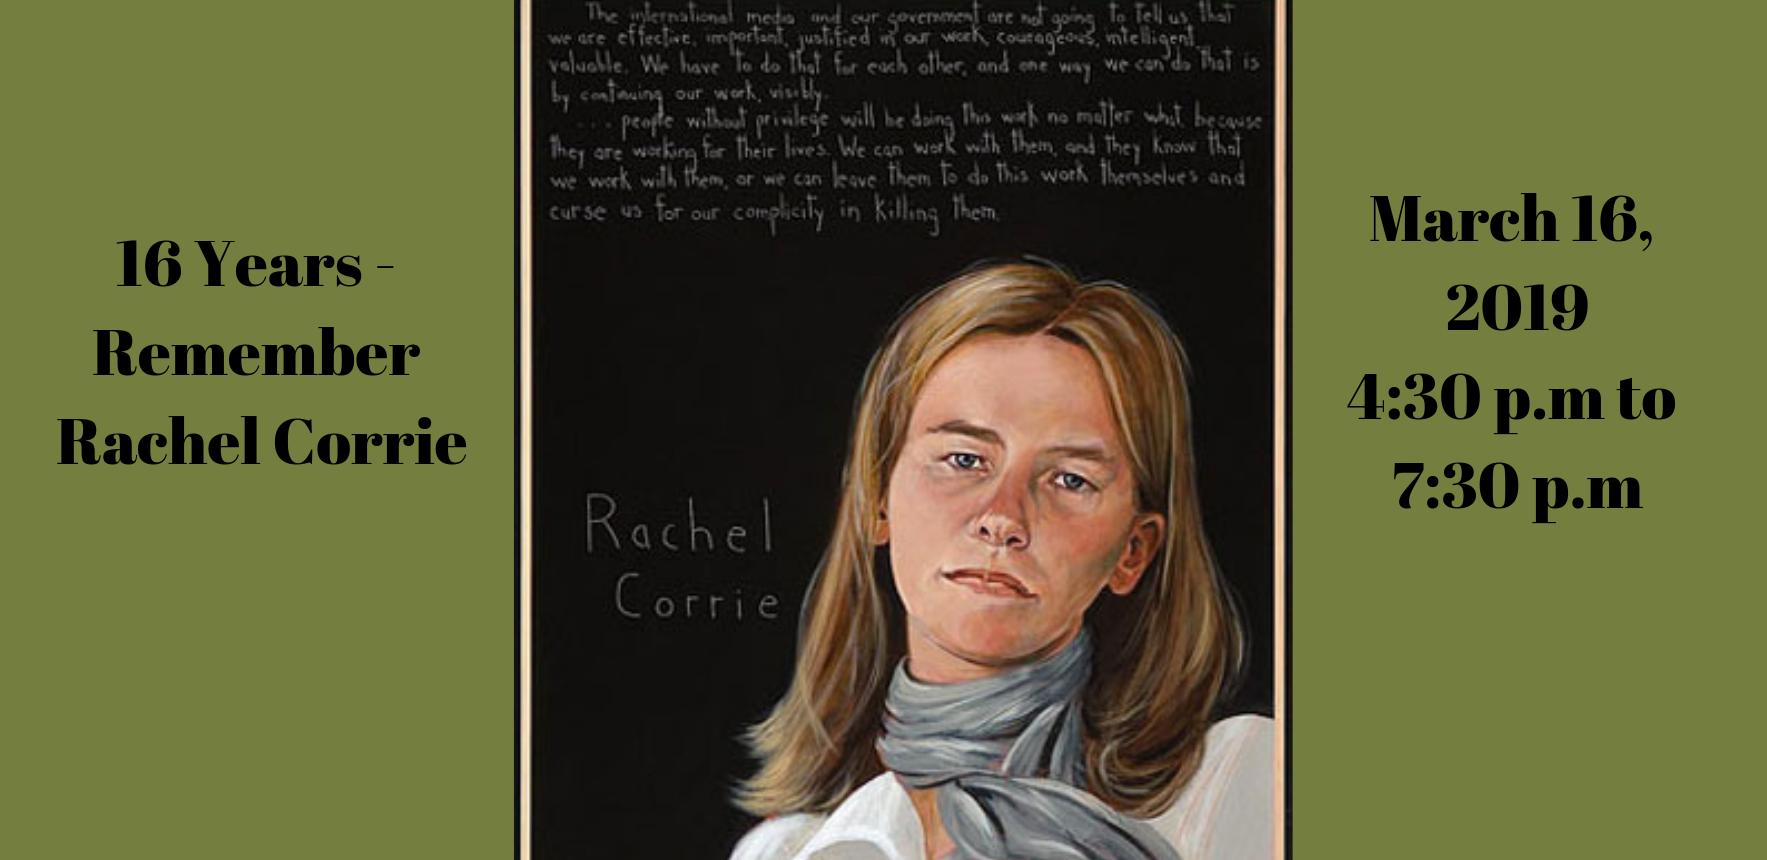 16 Years - Remembering Rachel Corrie: Bridging the Issues image